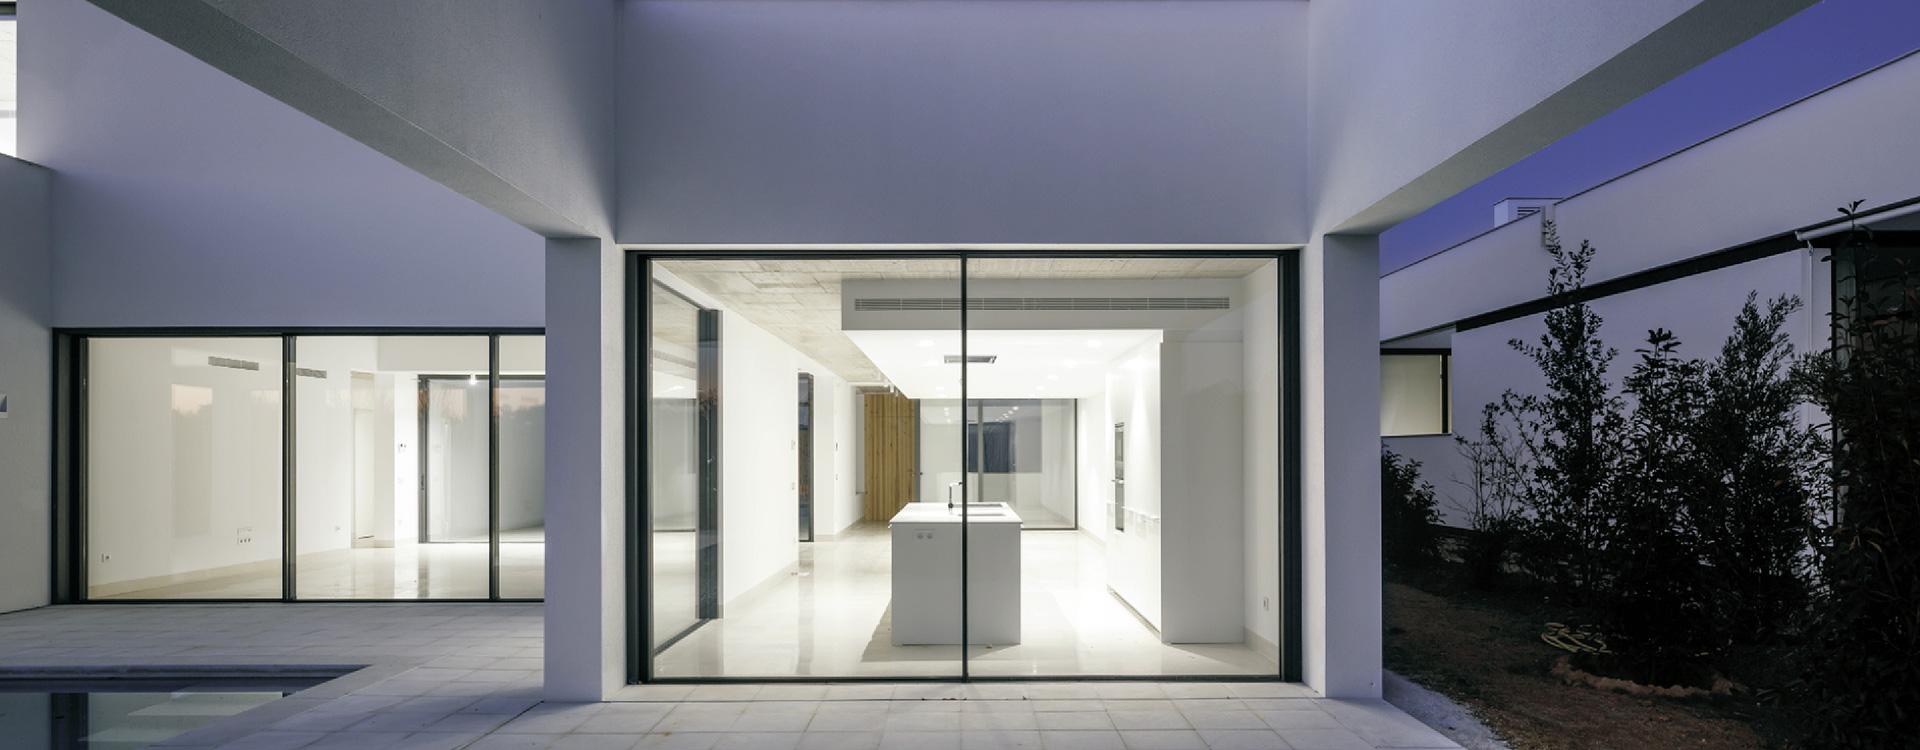 ventanas aluminio alicante